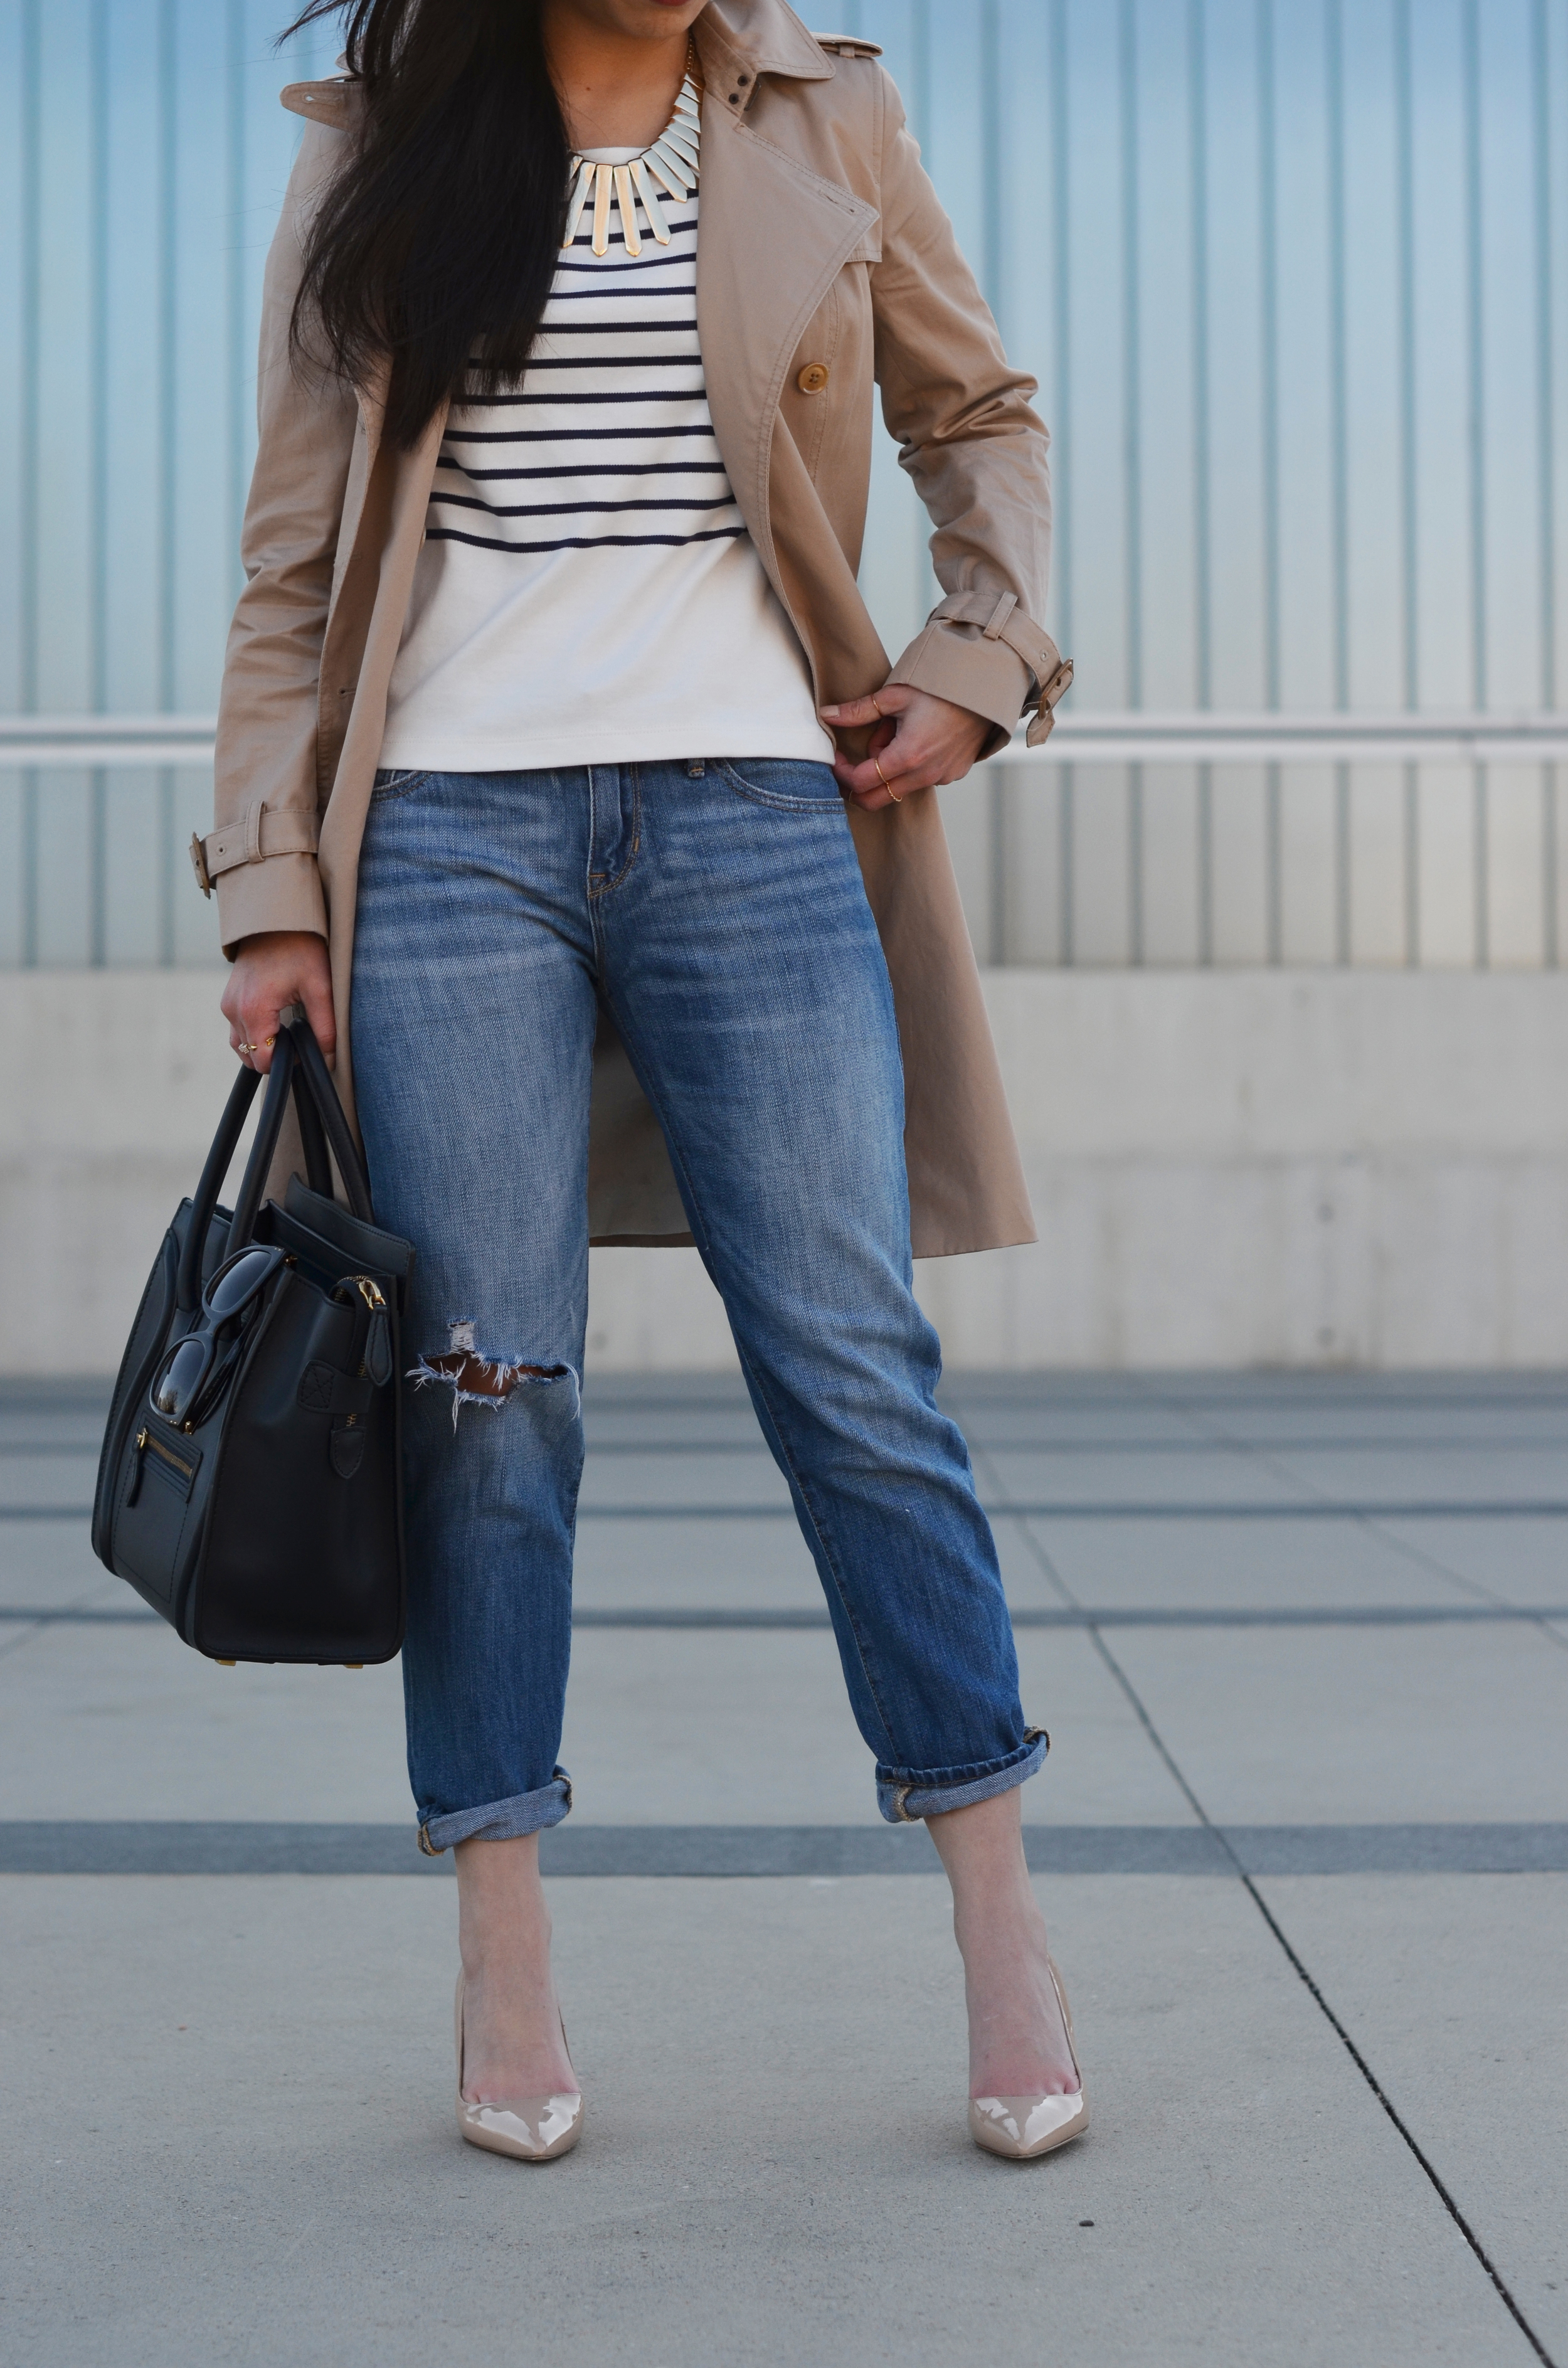 the spring trench & boyfriend jeans -- jannadoan.com